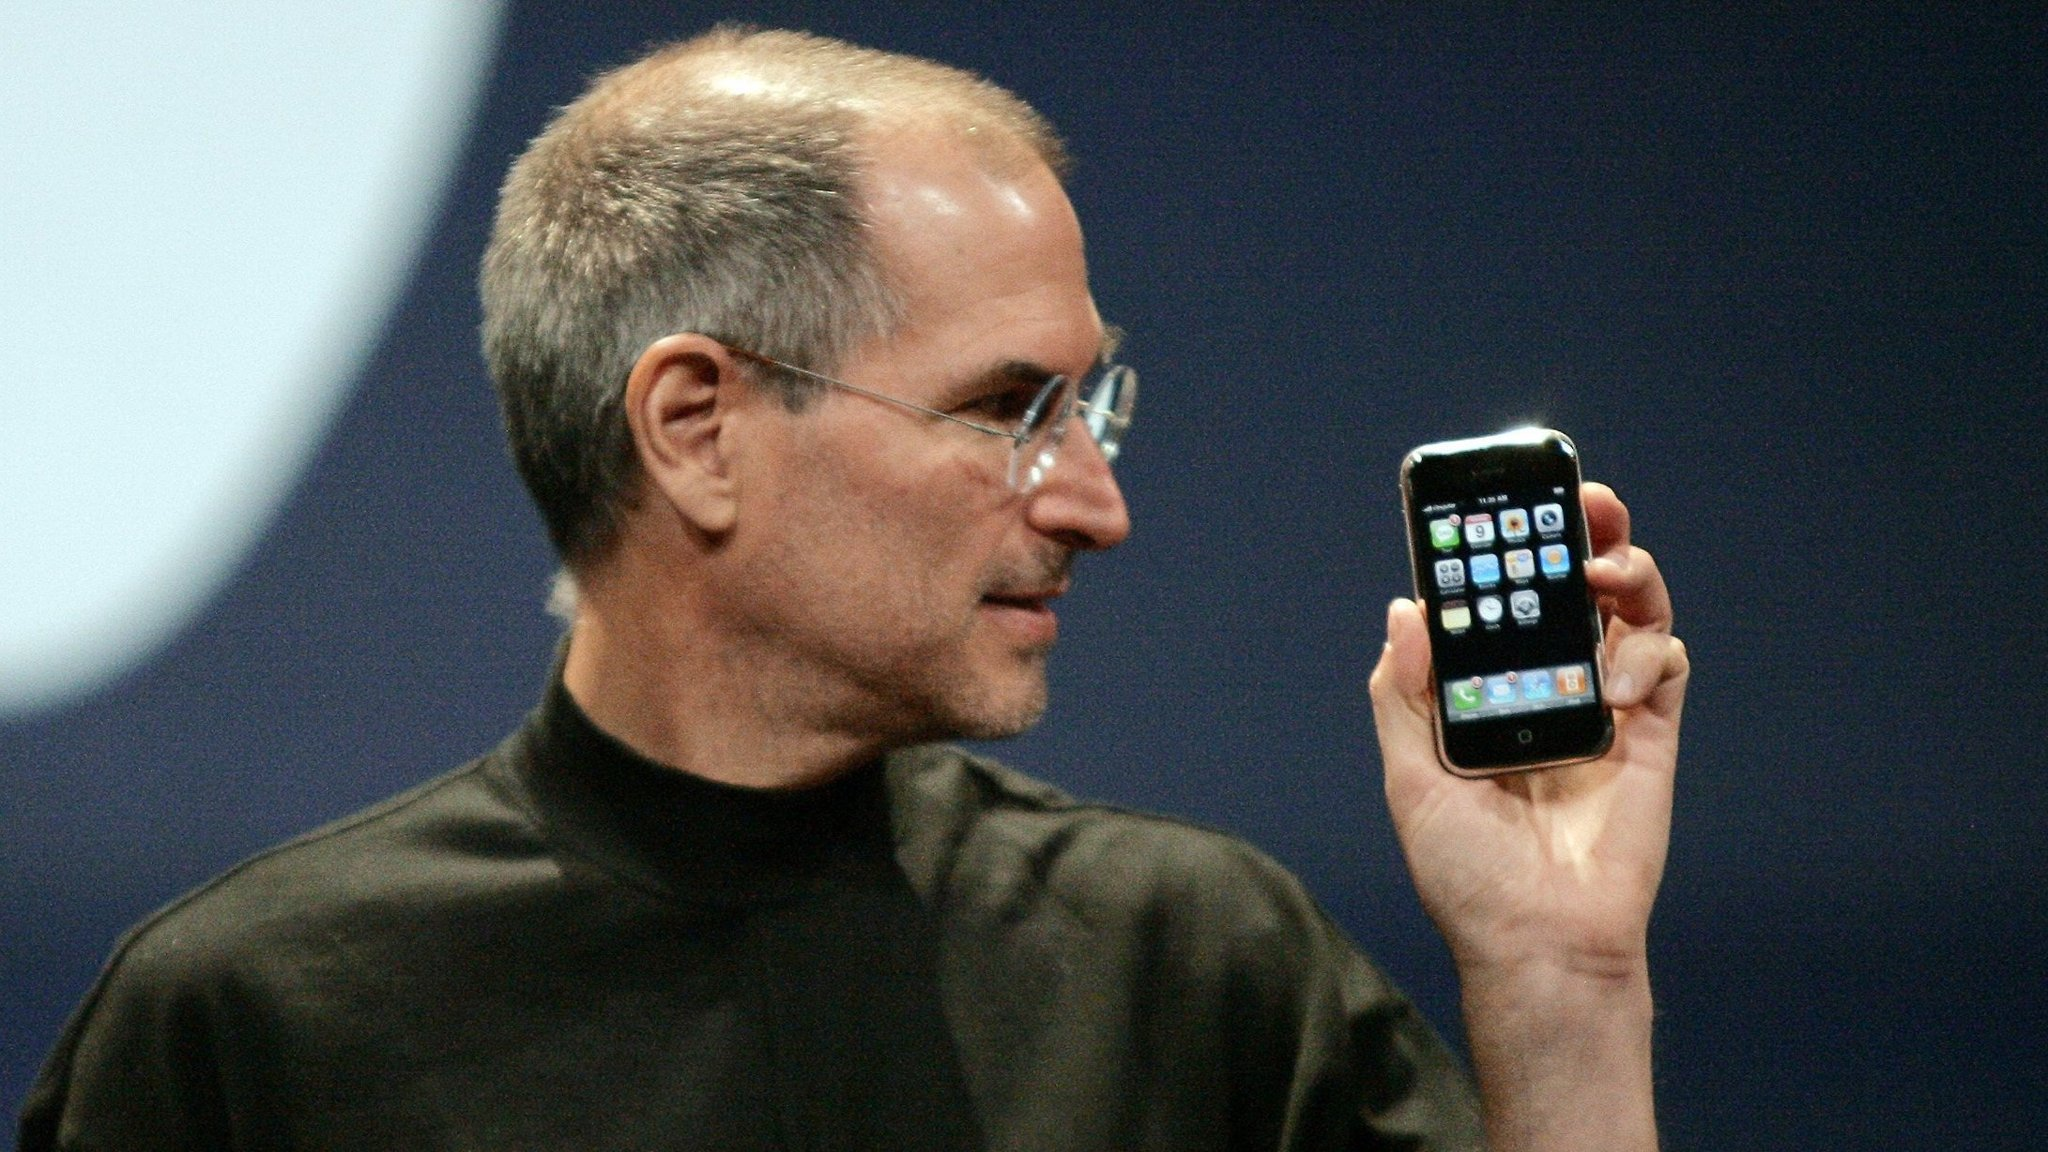 Steve Jobs Iphone 3 - HD Wallpaper